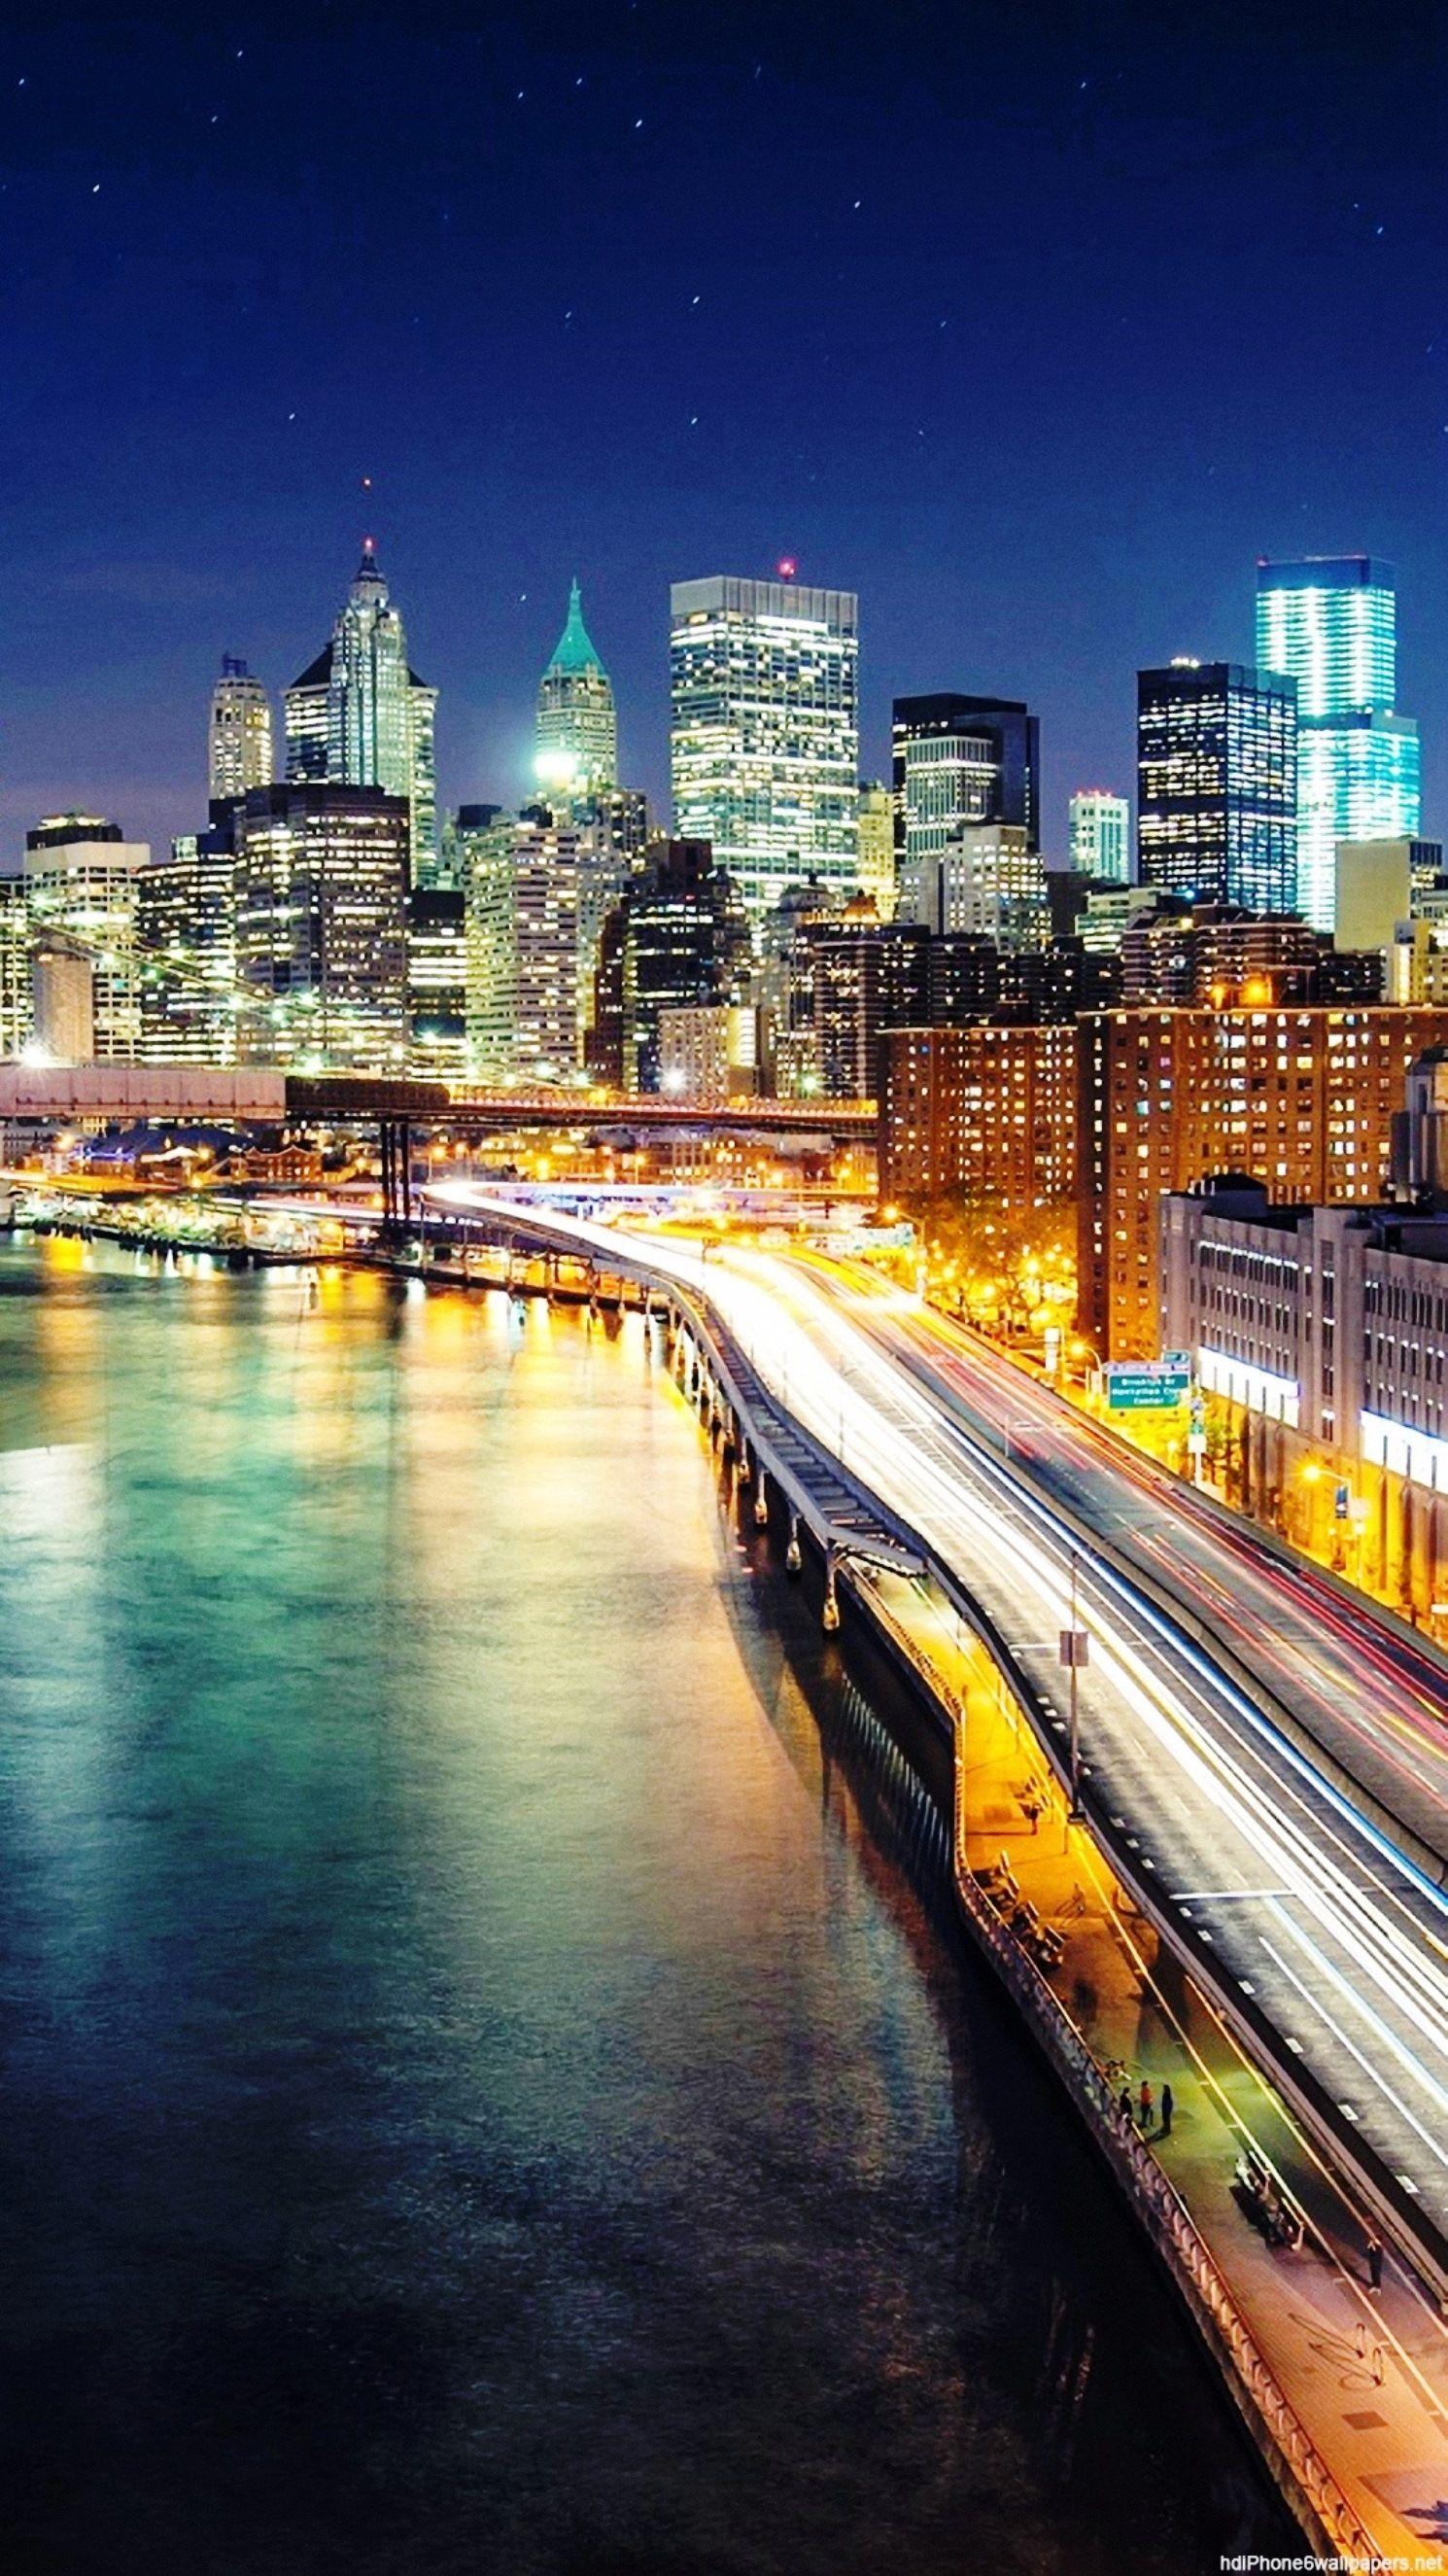 hd wallpapers 1080p city iphone – Best Wallpaper | Best Wallpaper | City iphone wallpaper, Hd ...